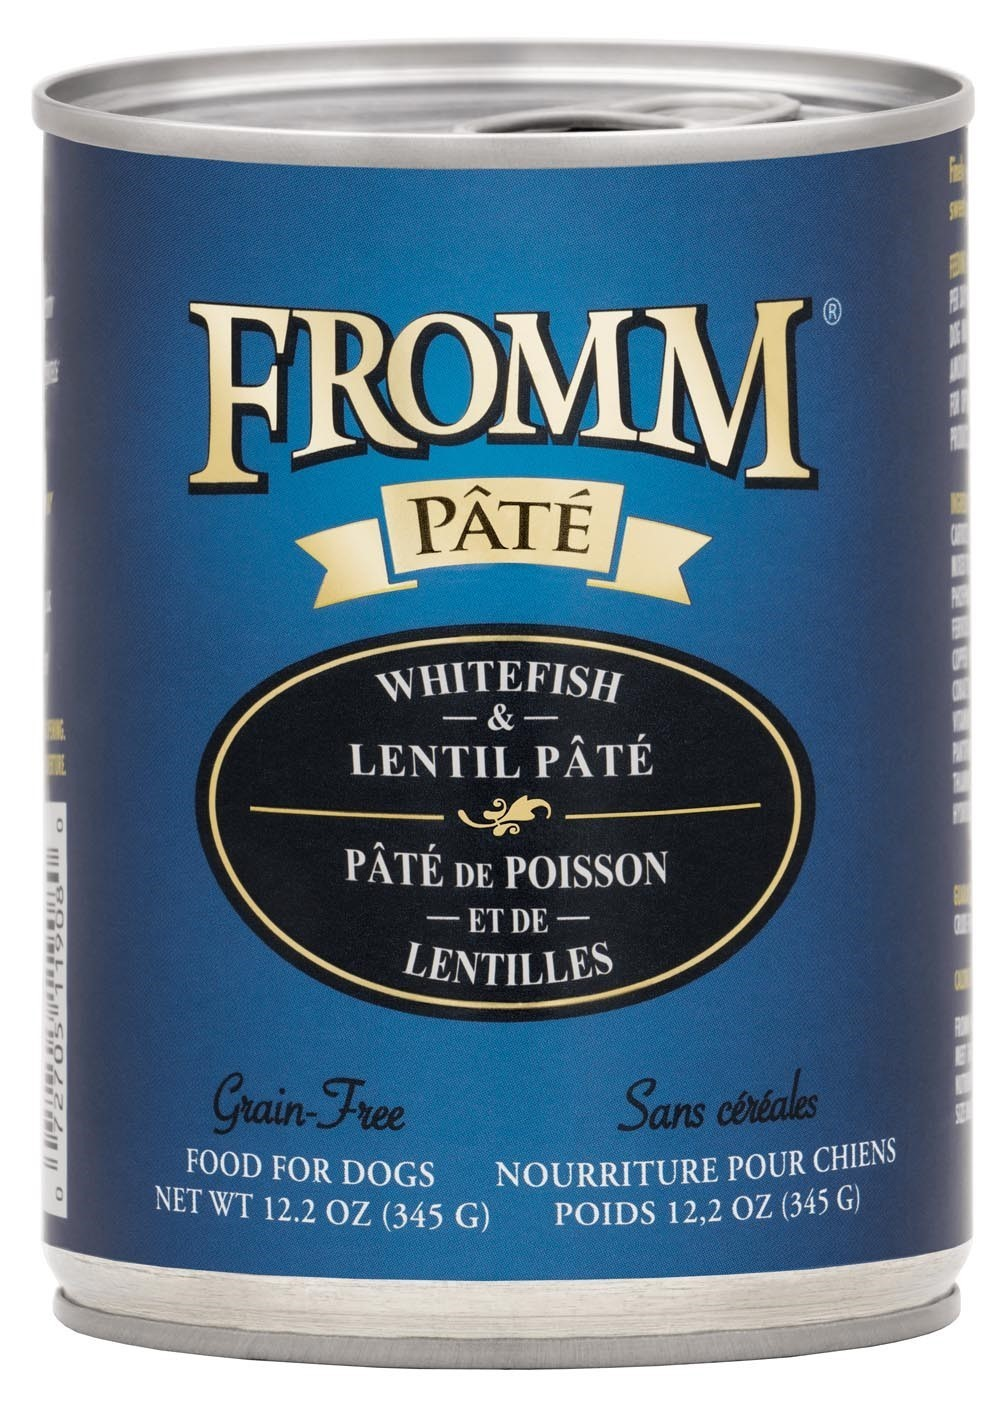 Fromm Pate Whitefish & Lentil 12.2oz